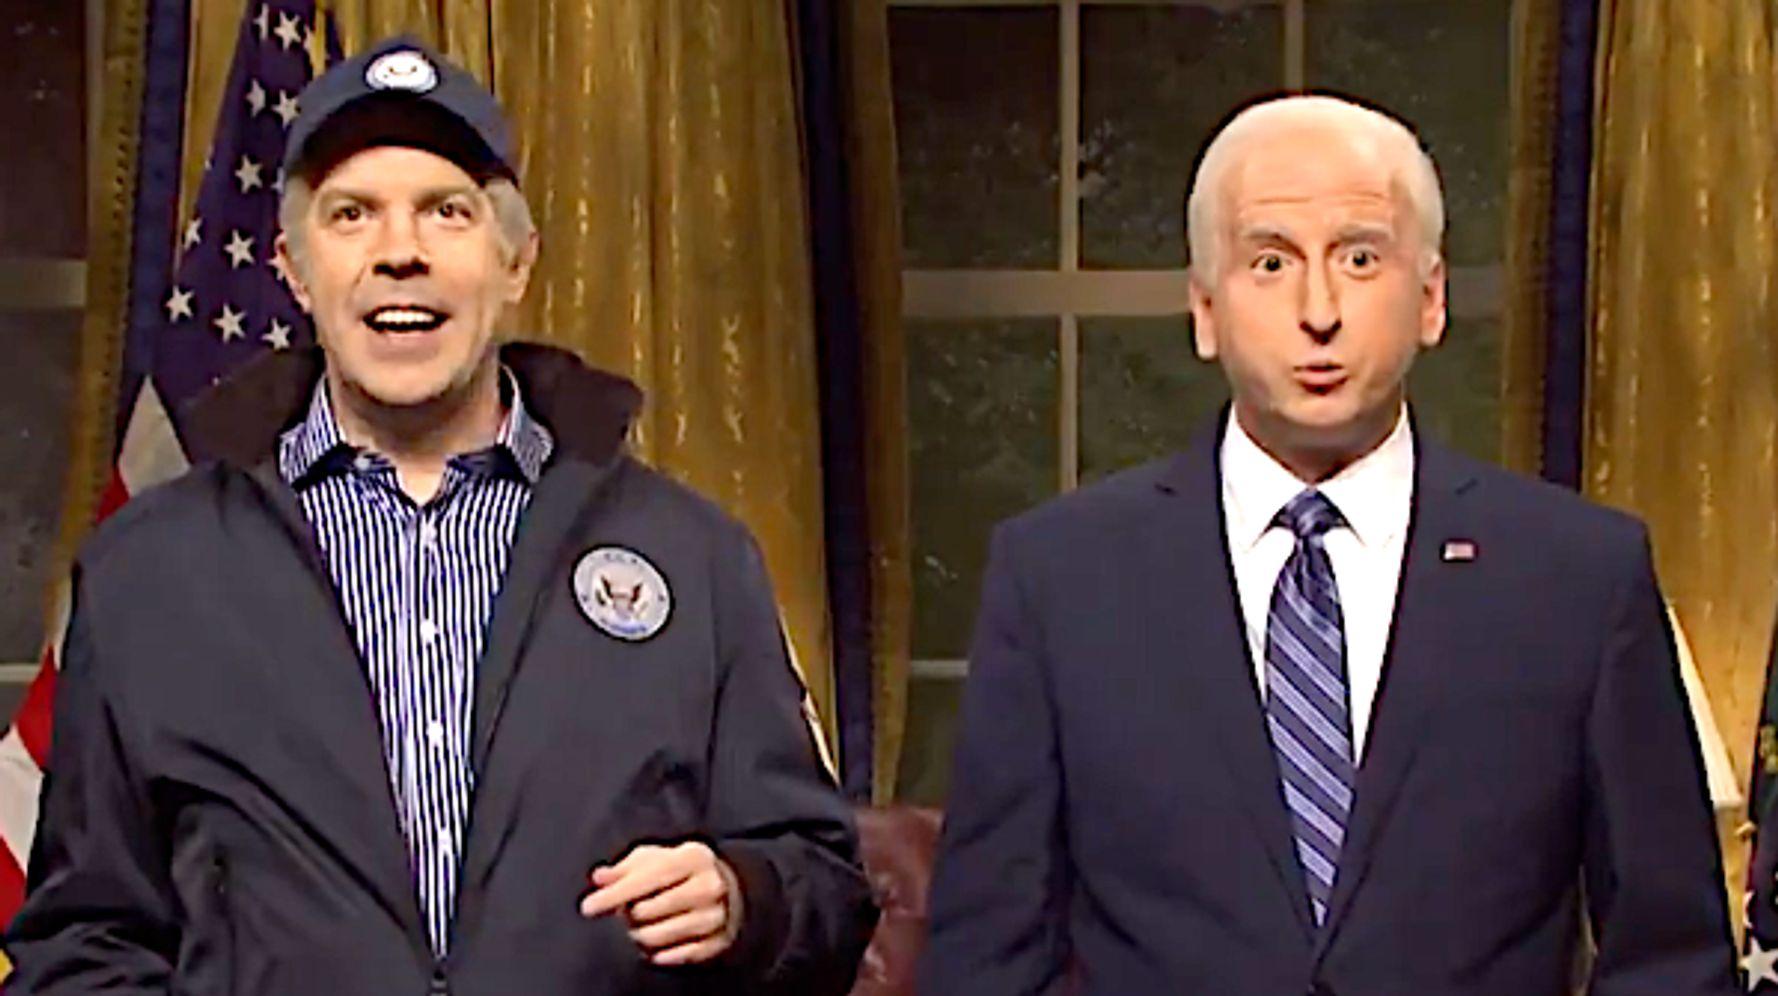 'Joe Biden' Meets His Cool Jason Sudeikis Self On 'Saturday Night Live'